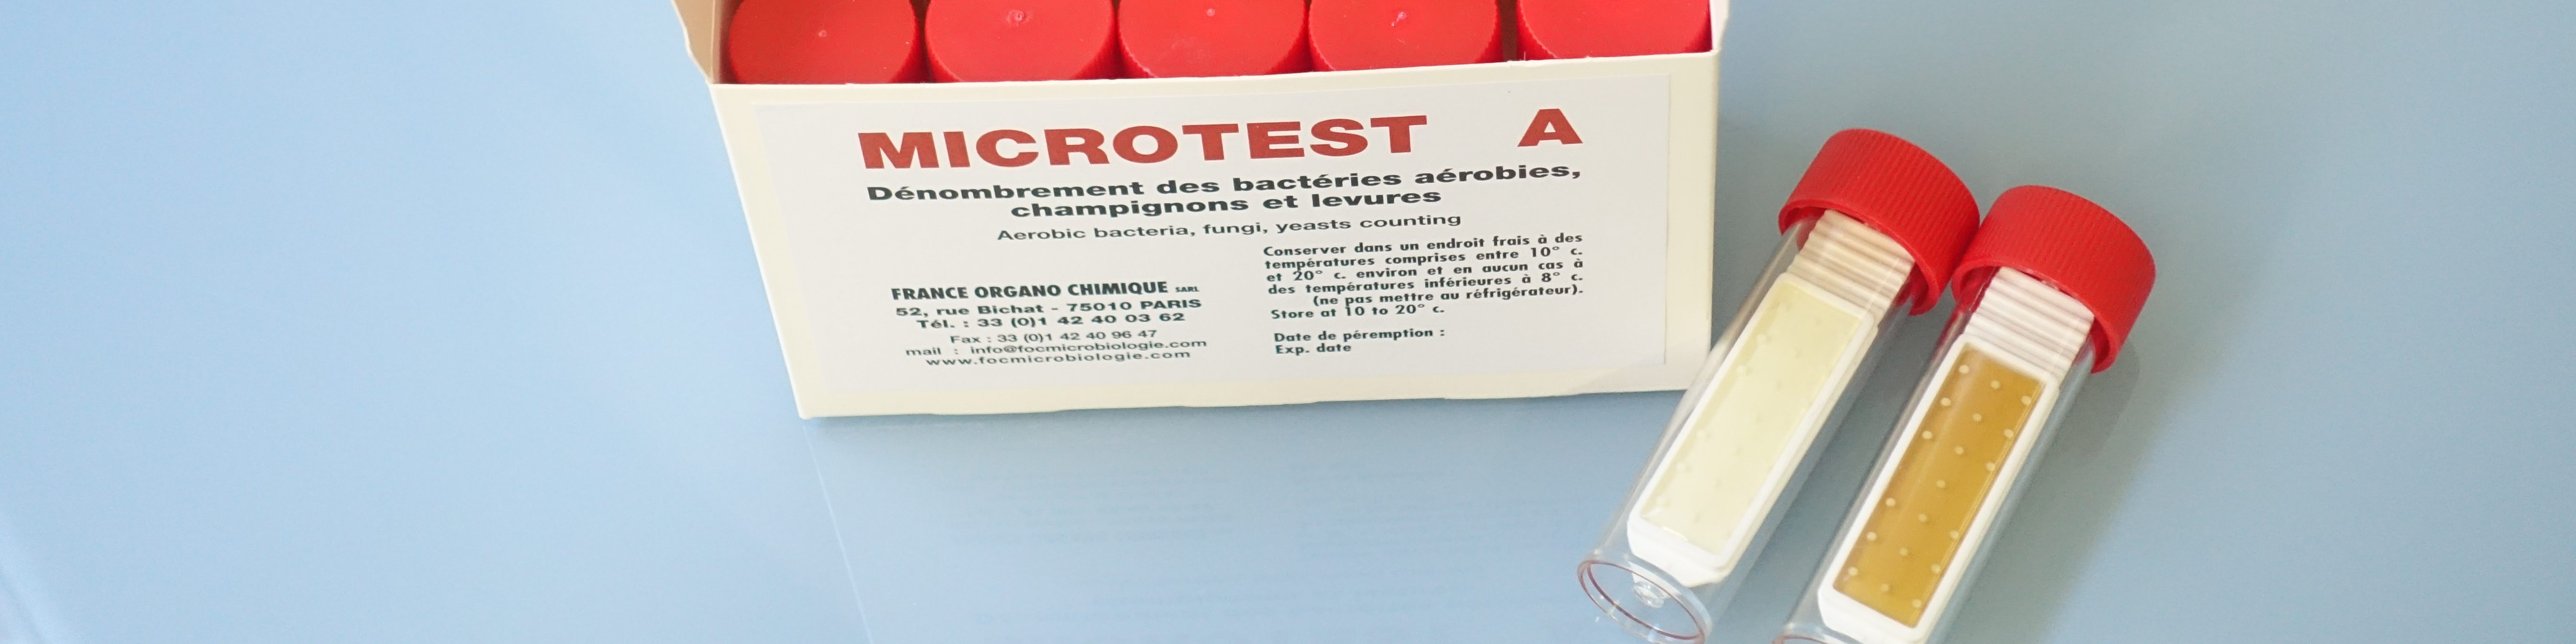 Tests de biocontamination France Organo Chimique